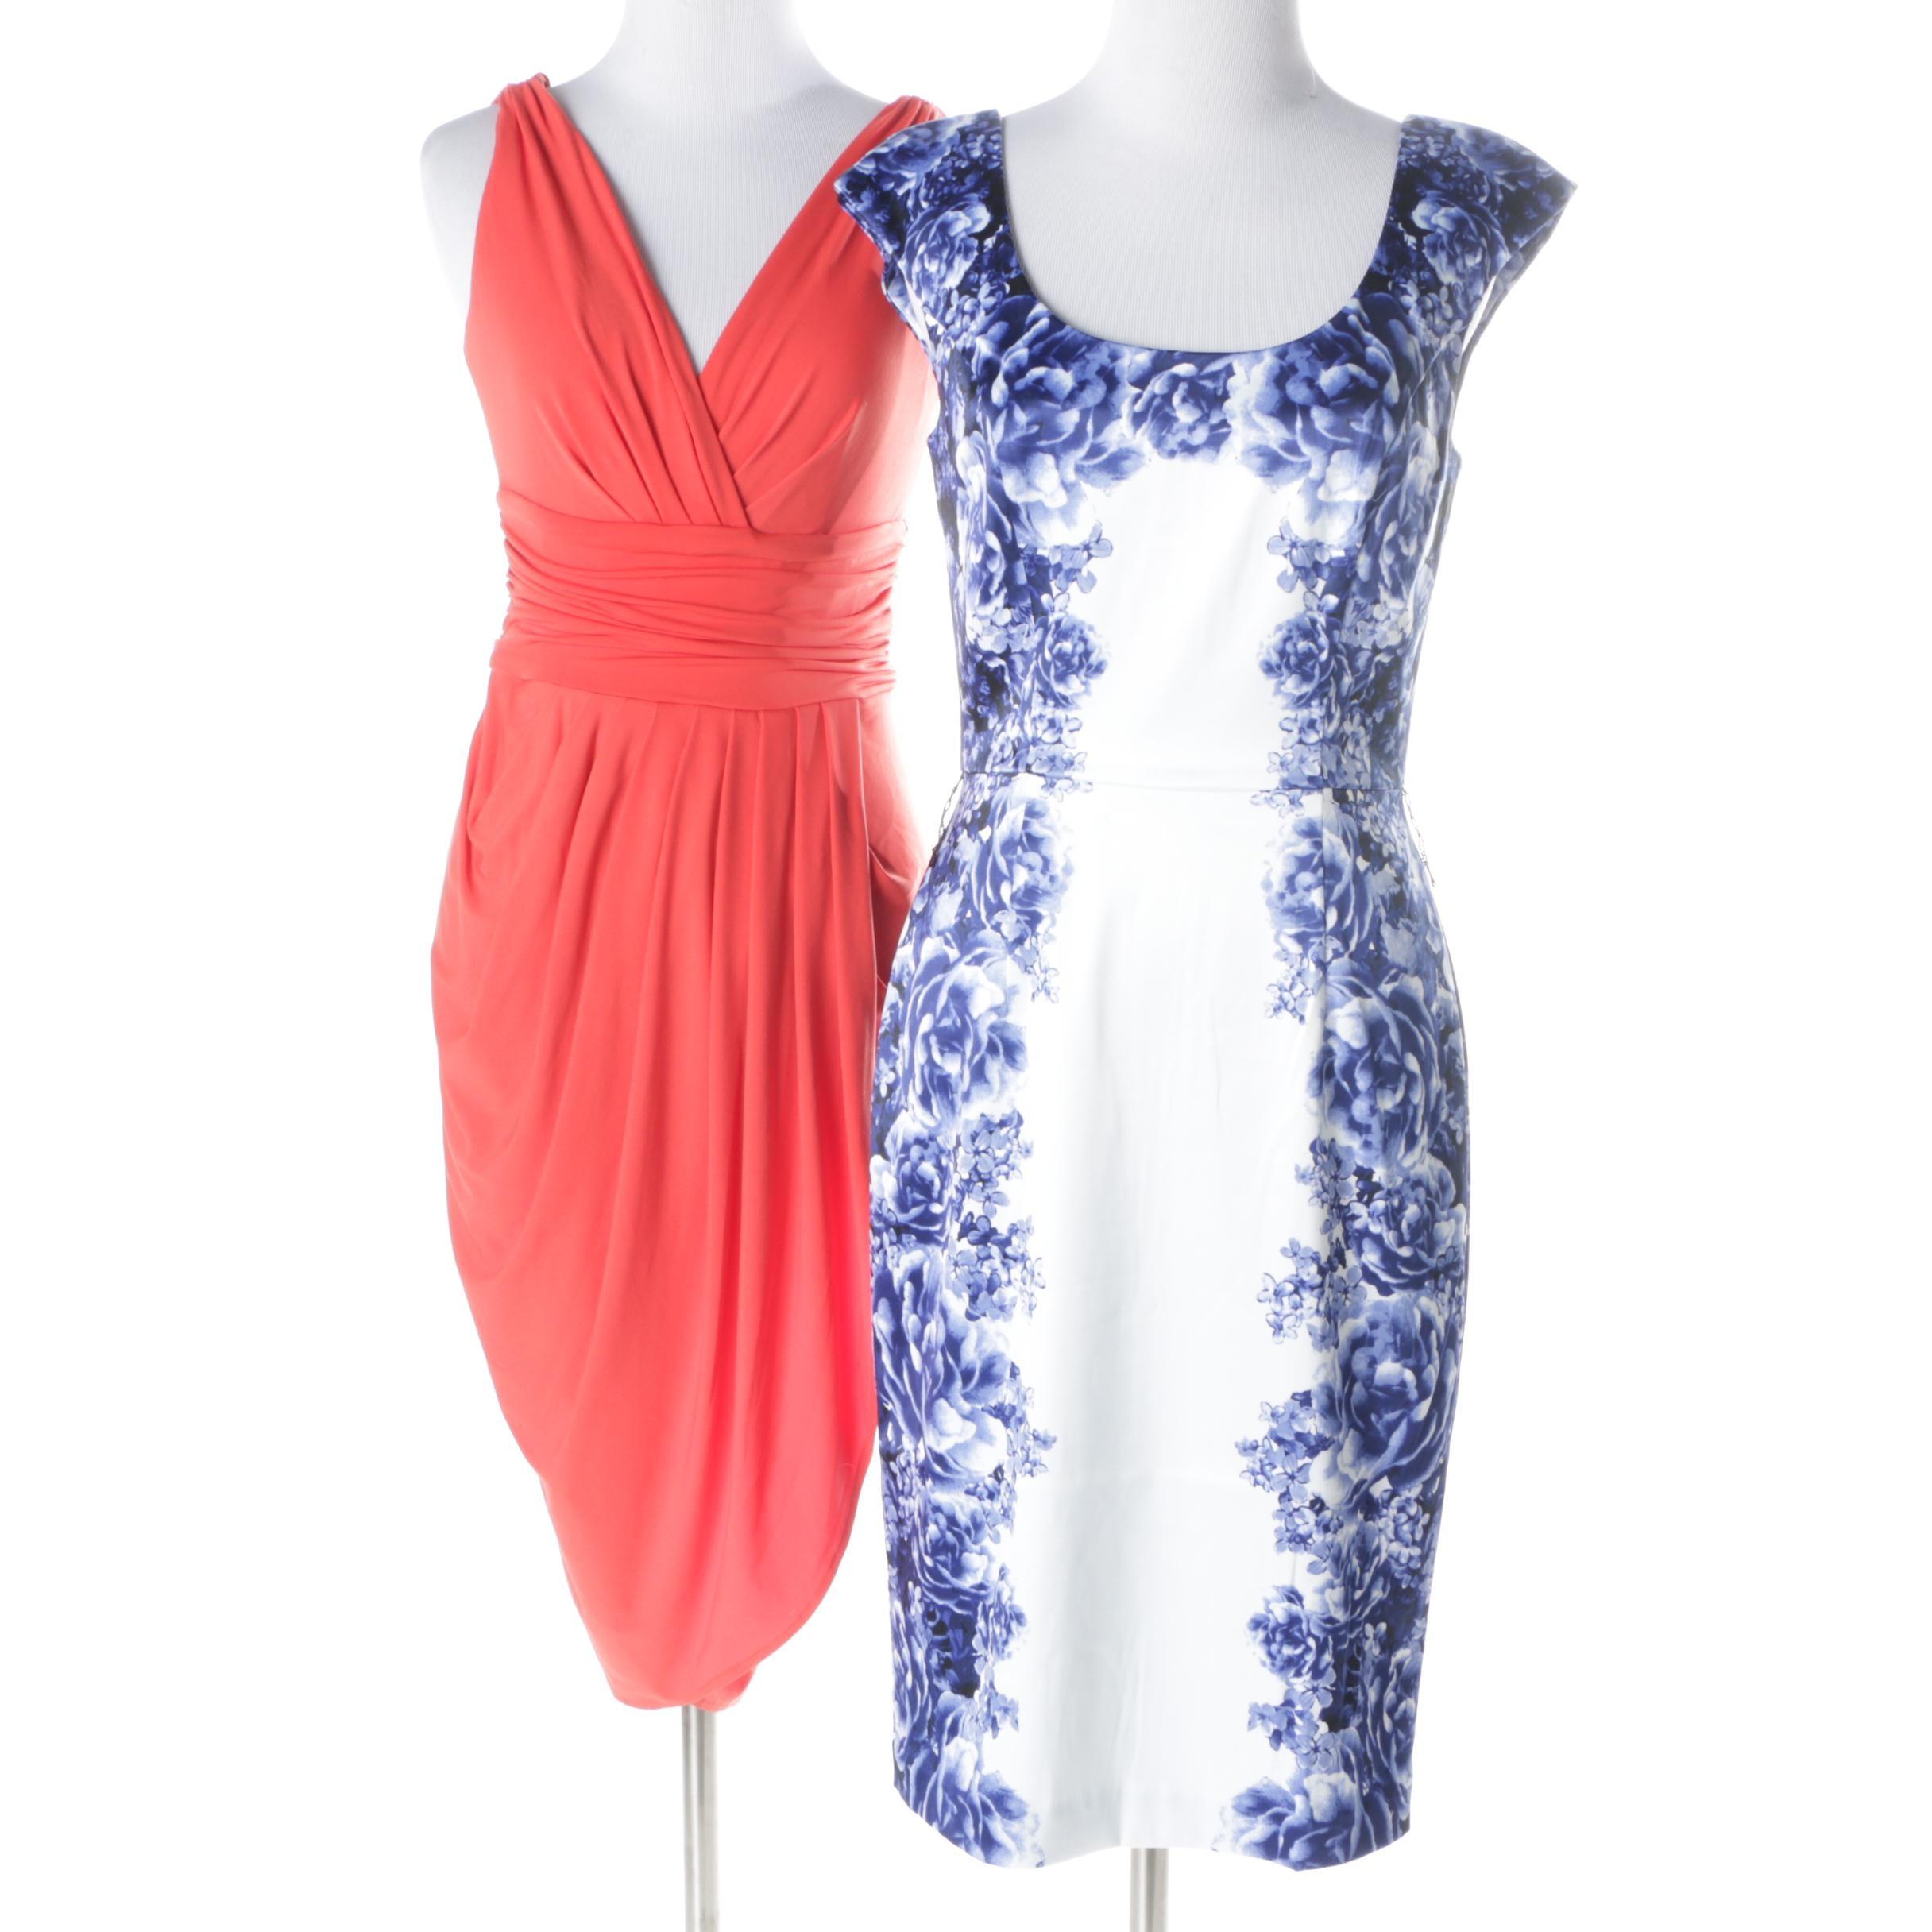 Women's Boston Proper and White House Black Market Fitted Dresses